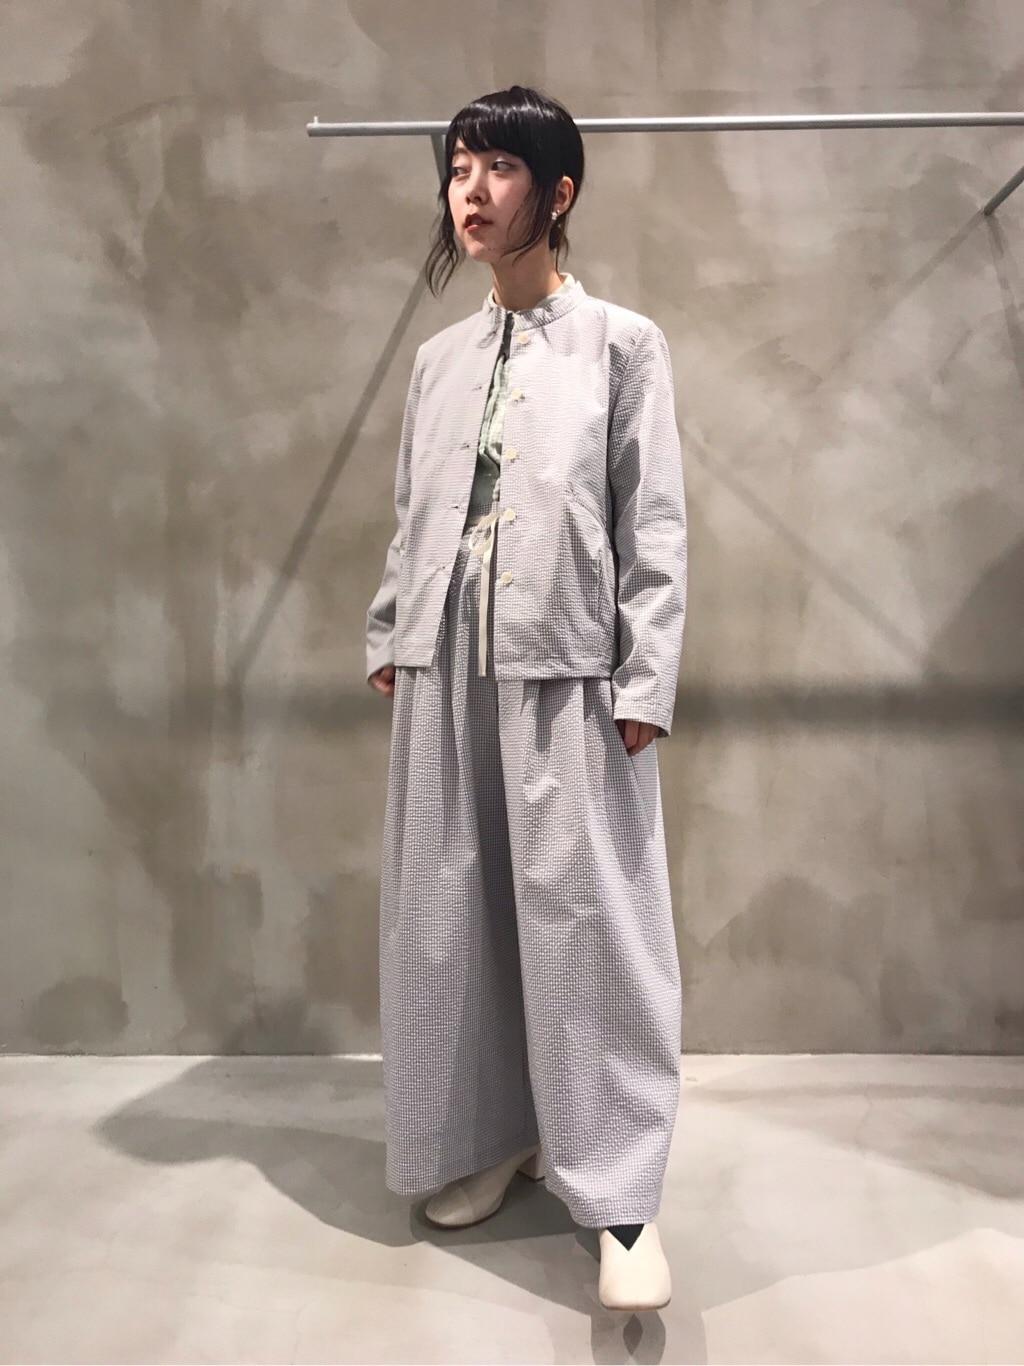 bulle de savon 渋谷スクランブルスクエア 身長:153cm 2020.03.14